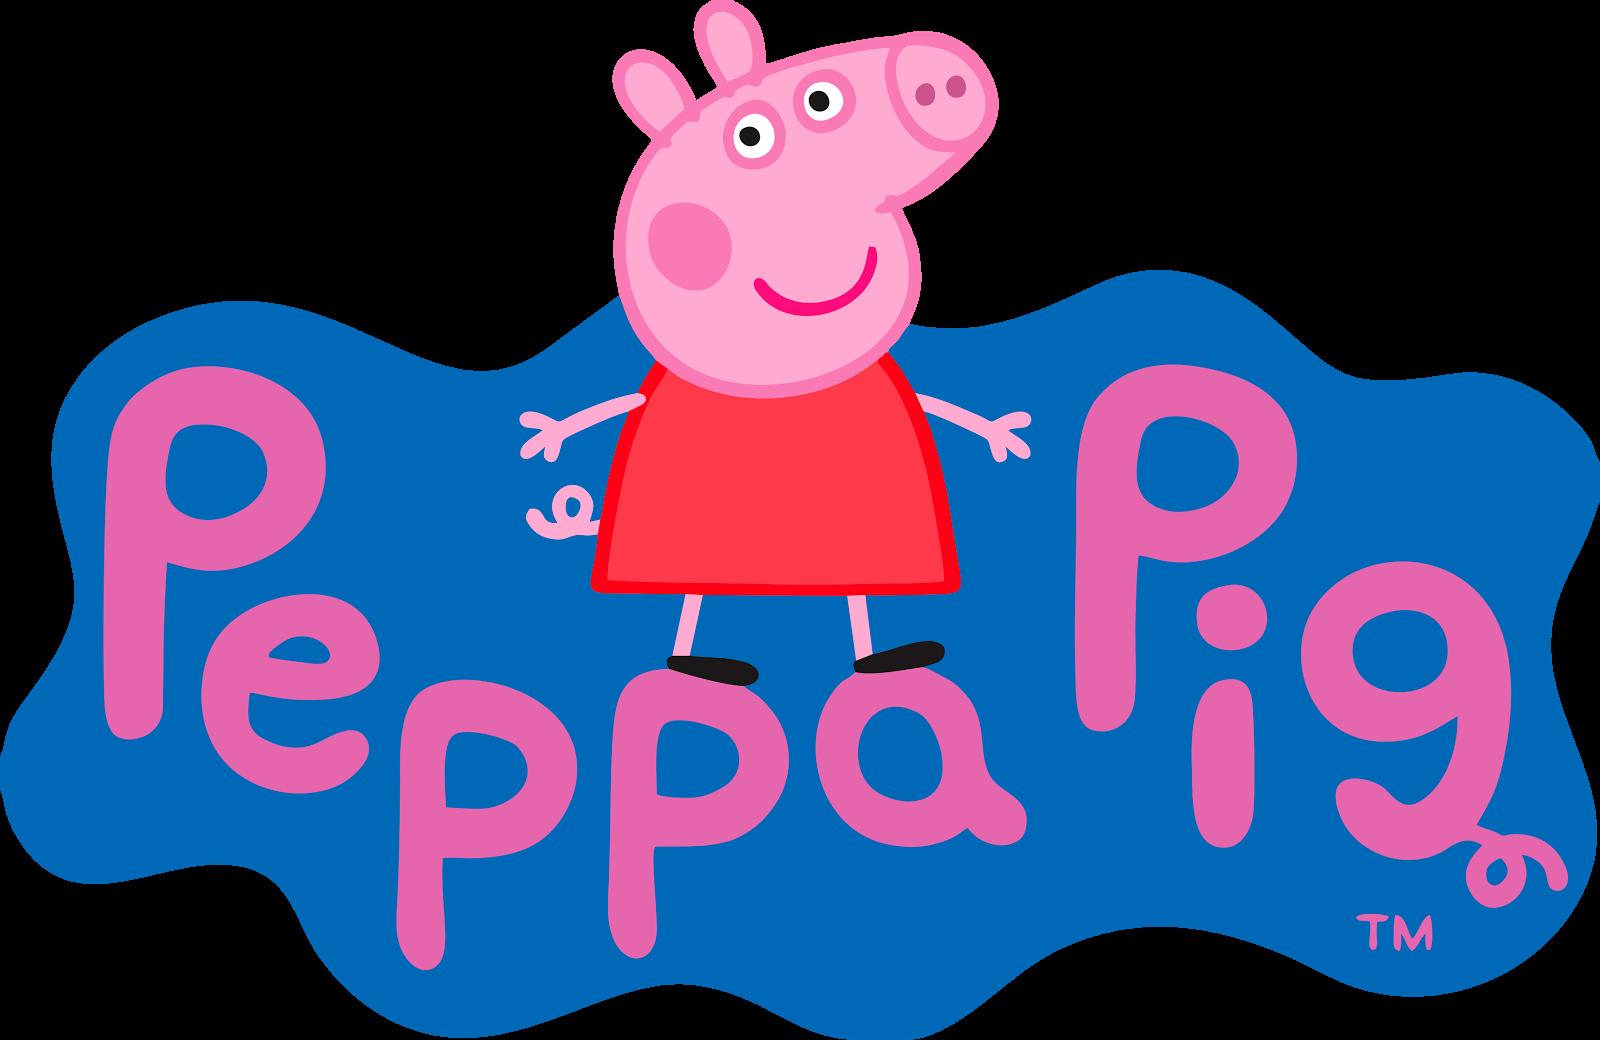 Bau De Imagens Peppa Pig Png